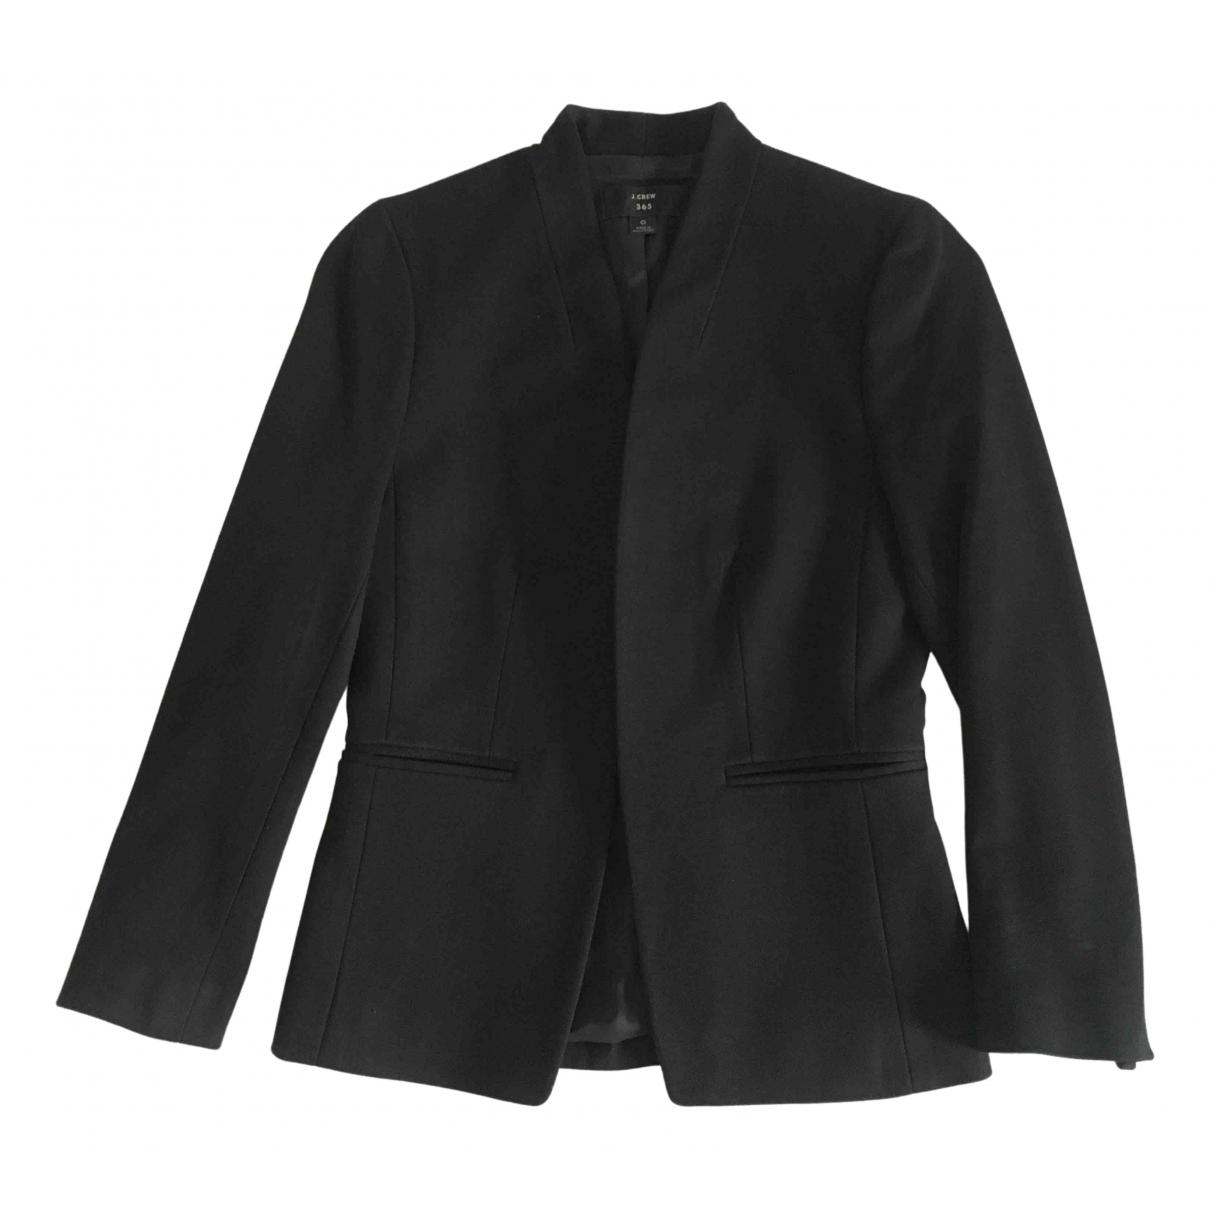 J.crew \N Black jacket for Women 0 0-5